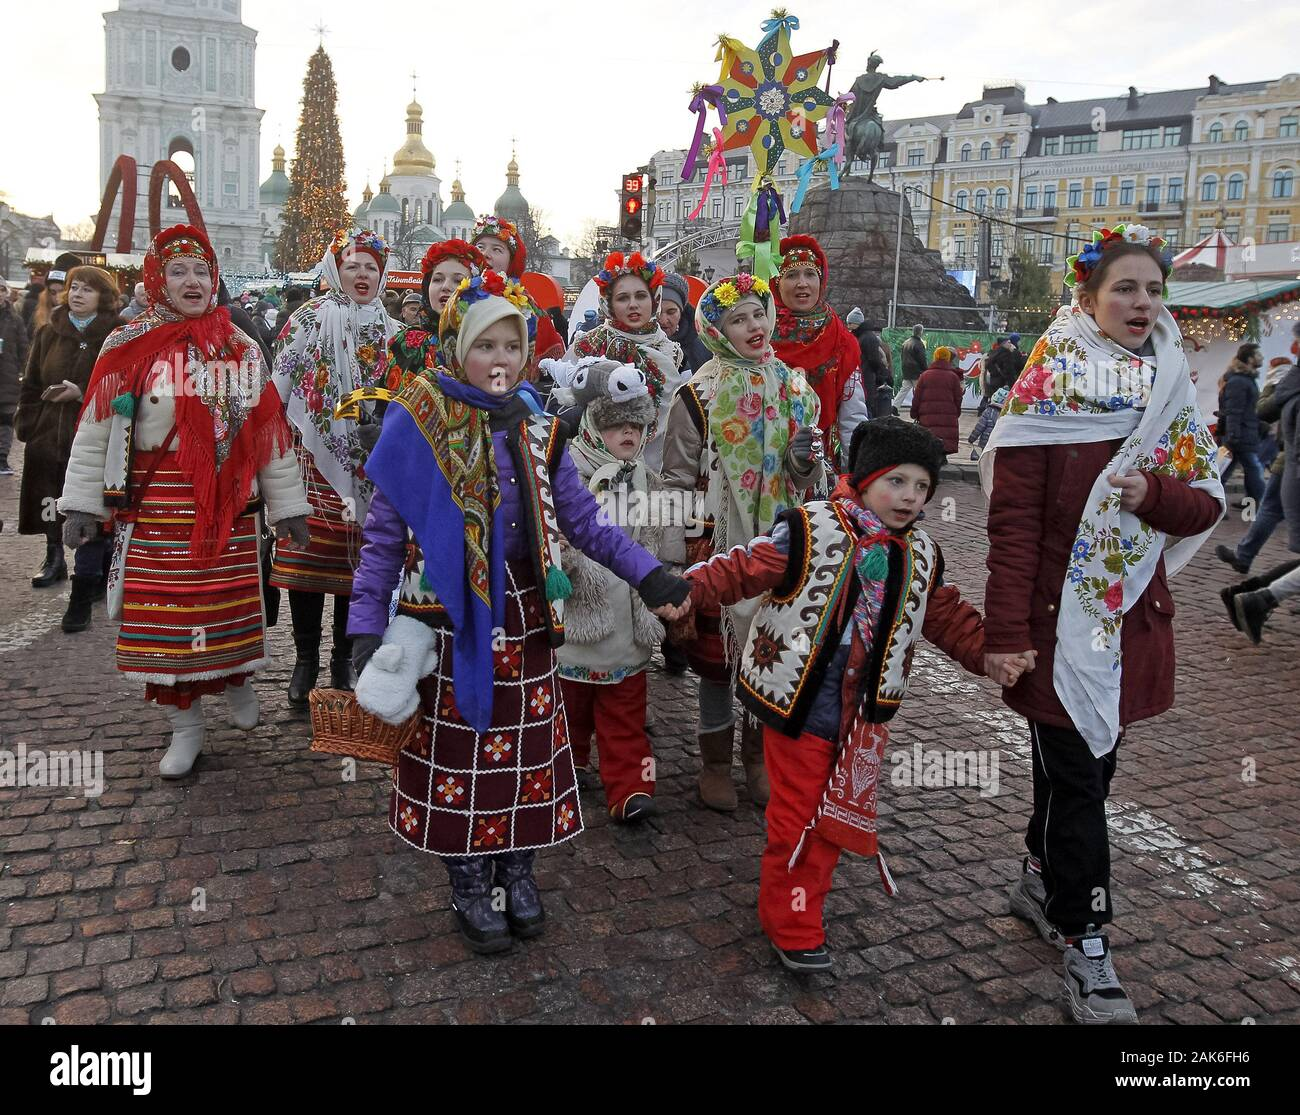 When does ukraine celebrate christmas